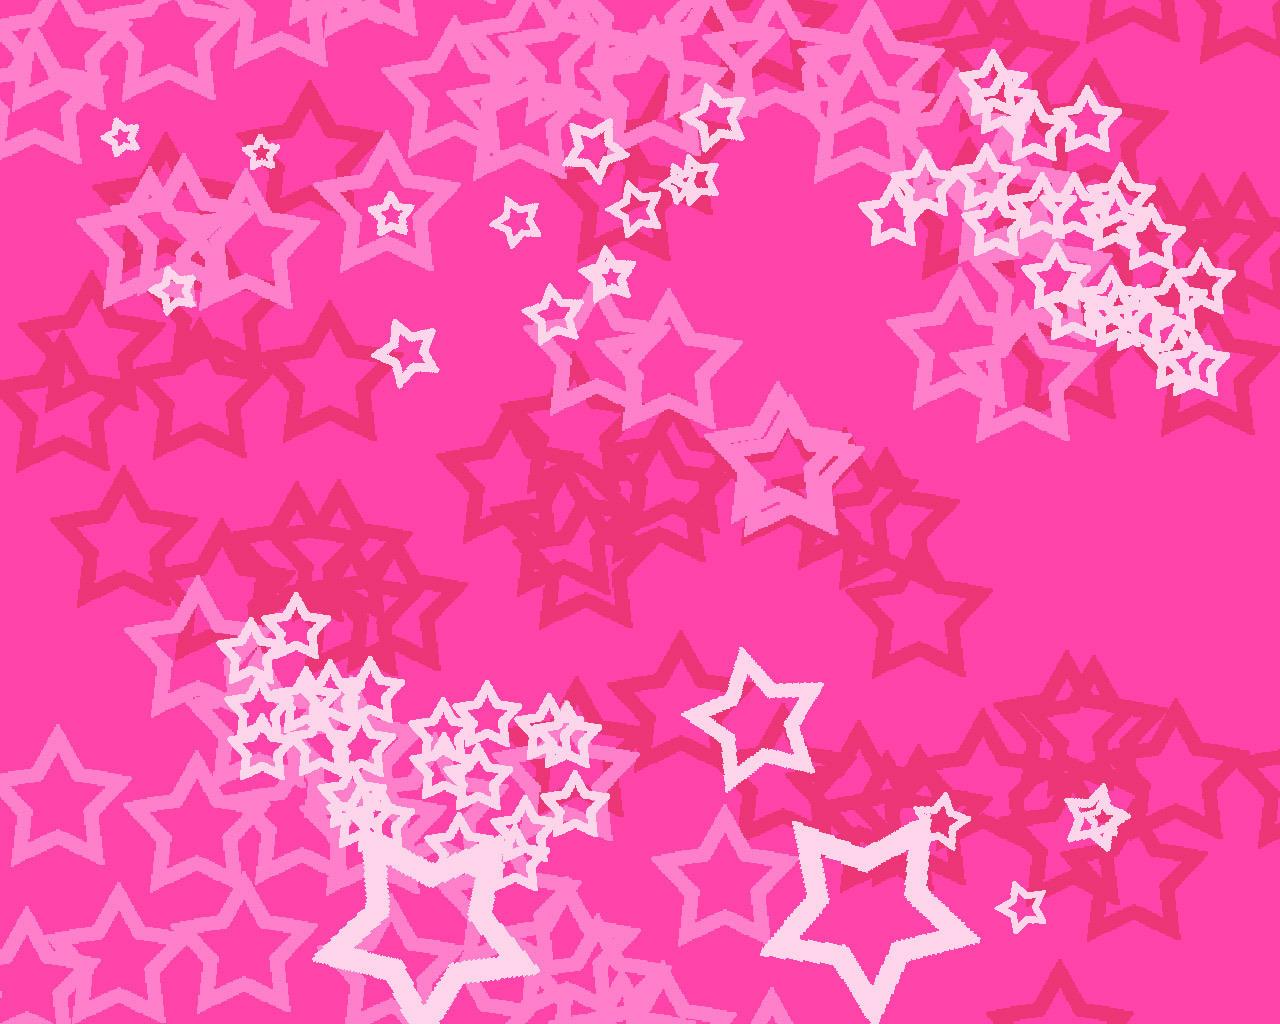 pink pink color pink wallpaper pink virus maurycy gomulicki pink pink 1280x1024